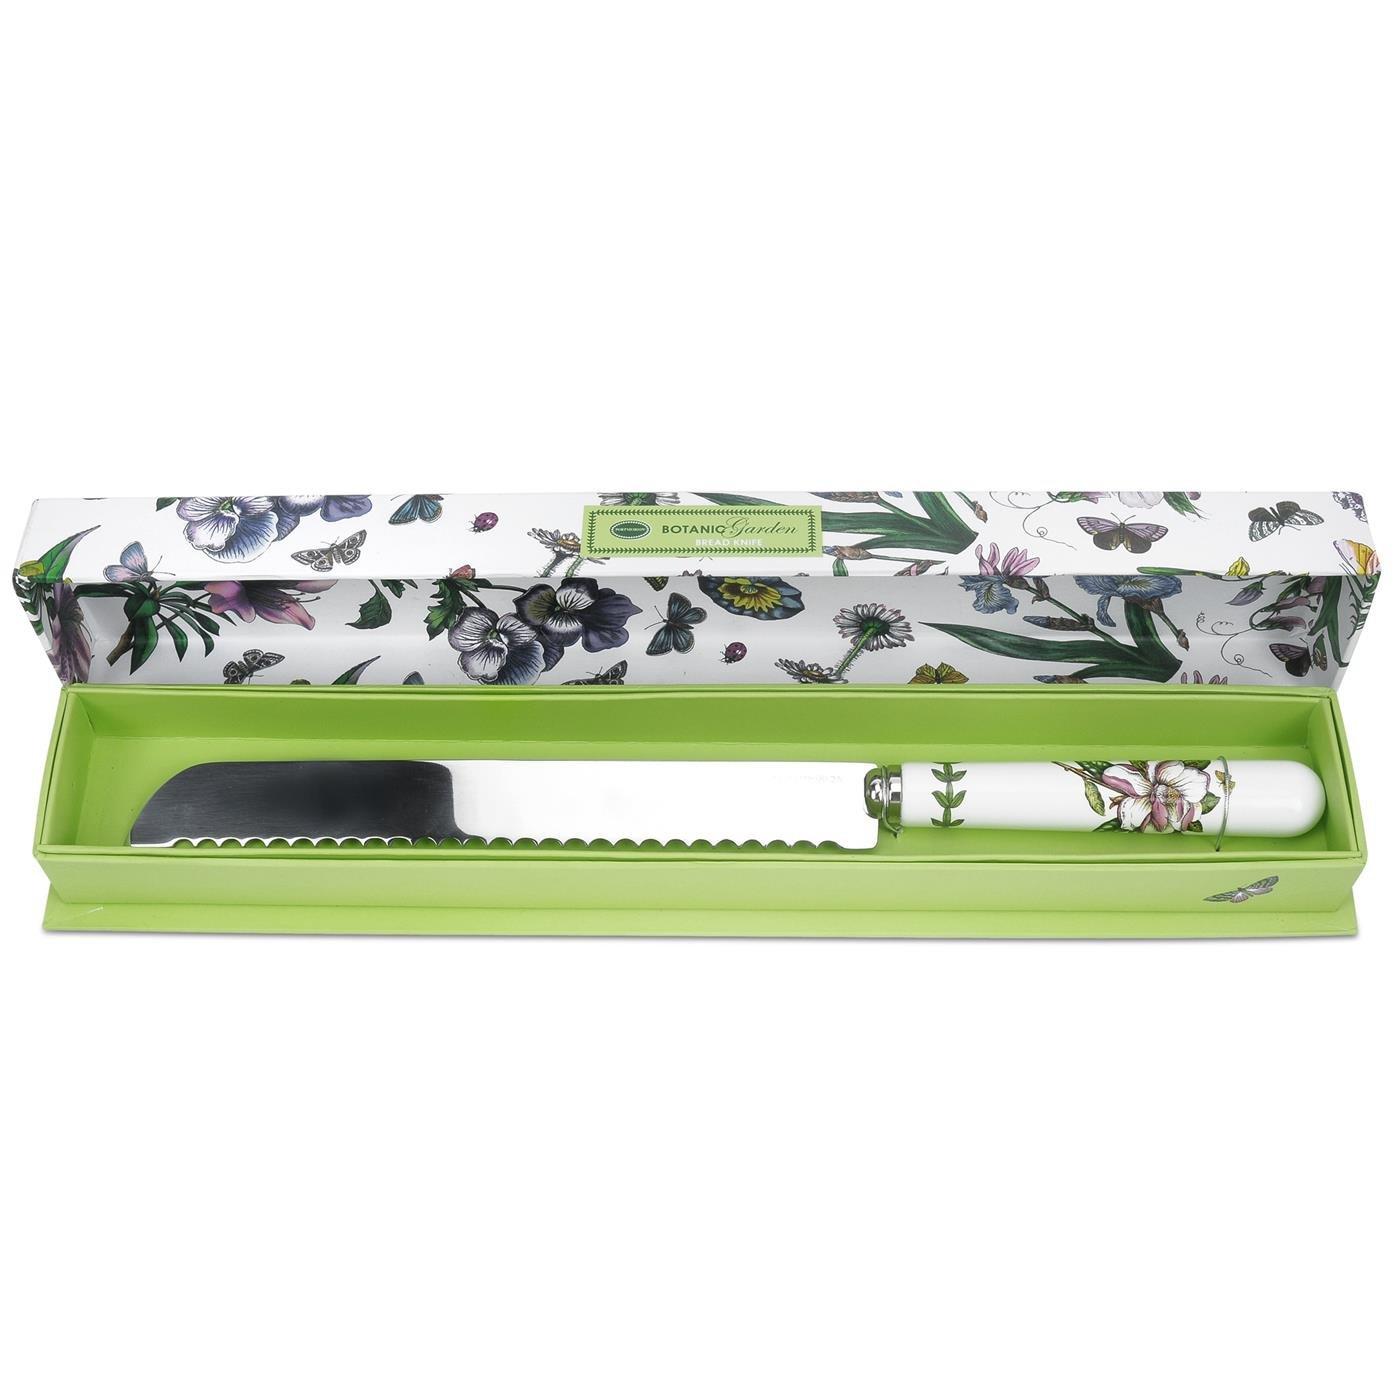 Botanic Garden Bread Knife, Porcelain, Multi-Colour, 2.5 x 34.5 x 1.5 cm Portmeirion 492578 LY-7TFF-X2R6